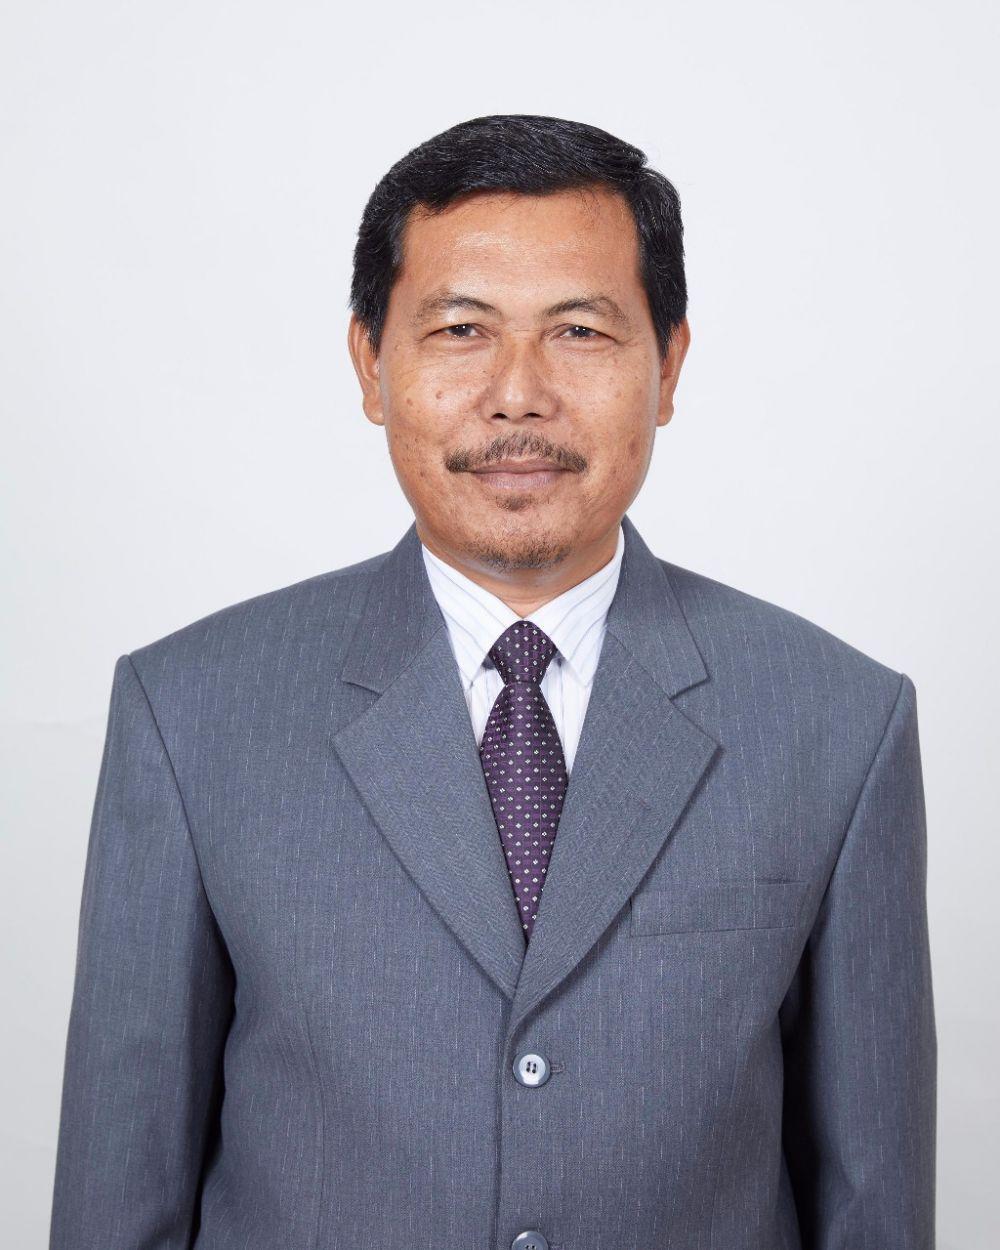 Faisal Alwi